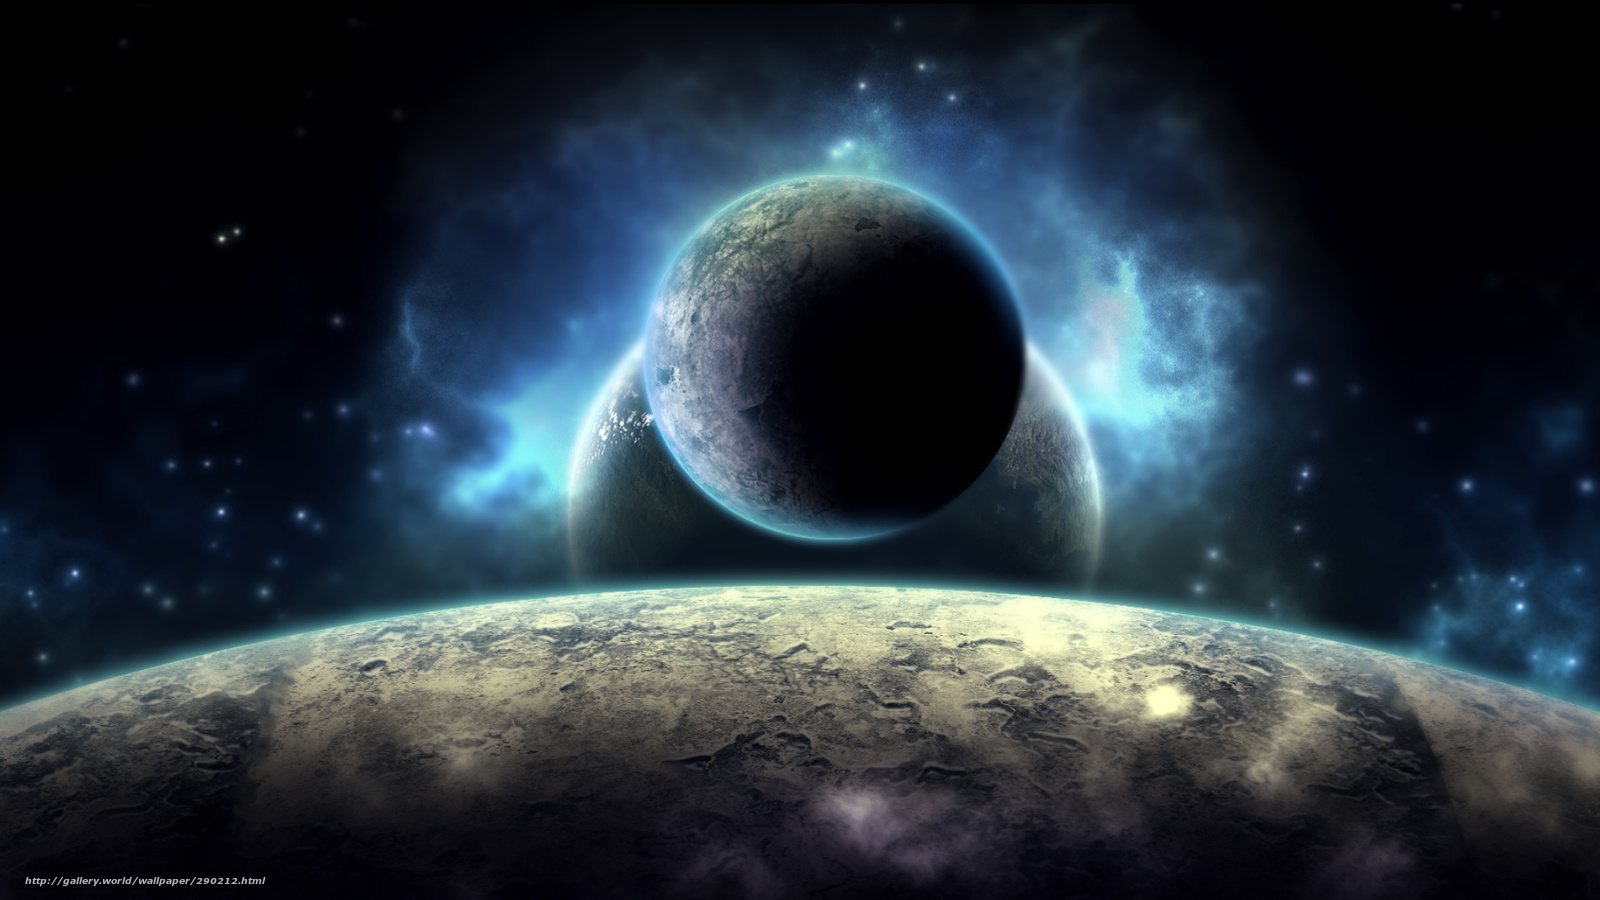 Scaricare gli sfondi universo pianeta luce sfondi gratis for Sfondi desktop universo